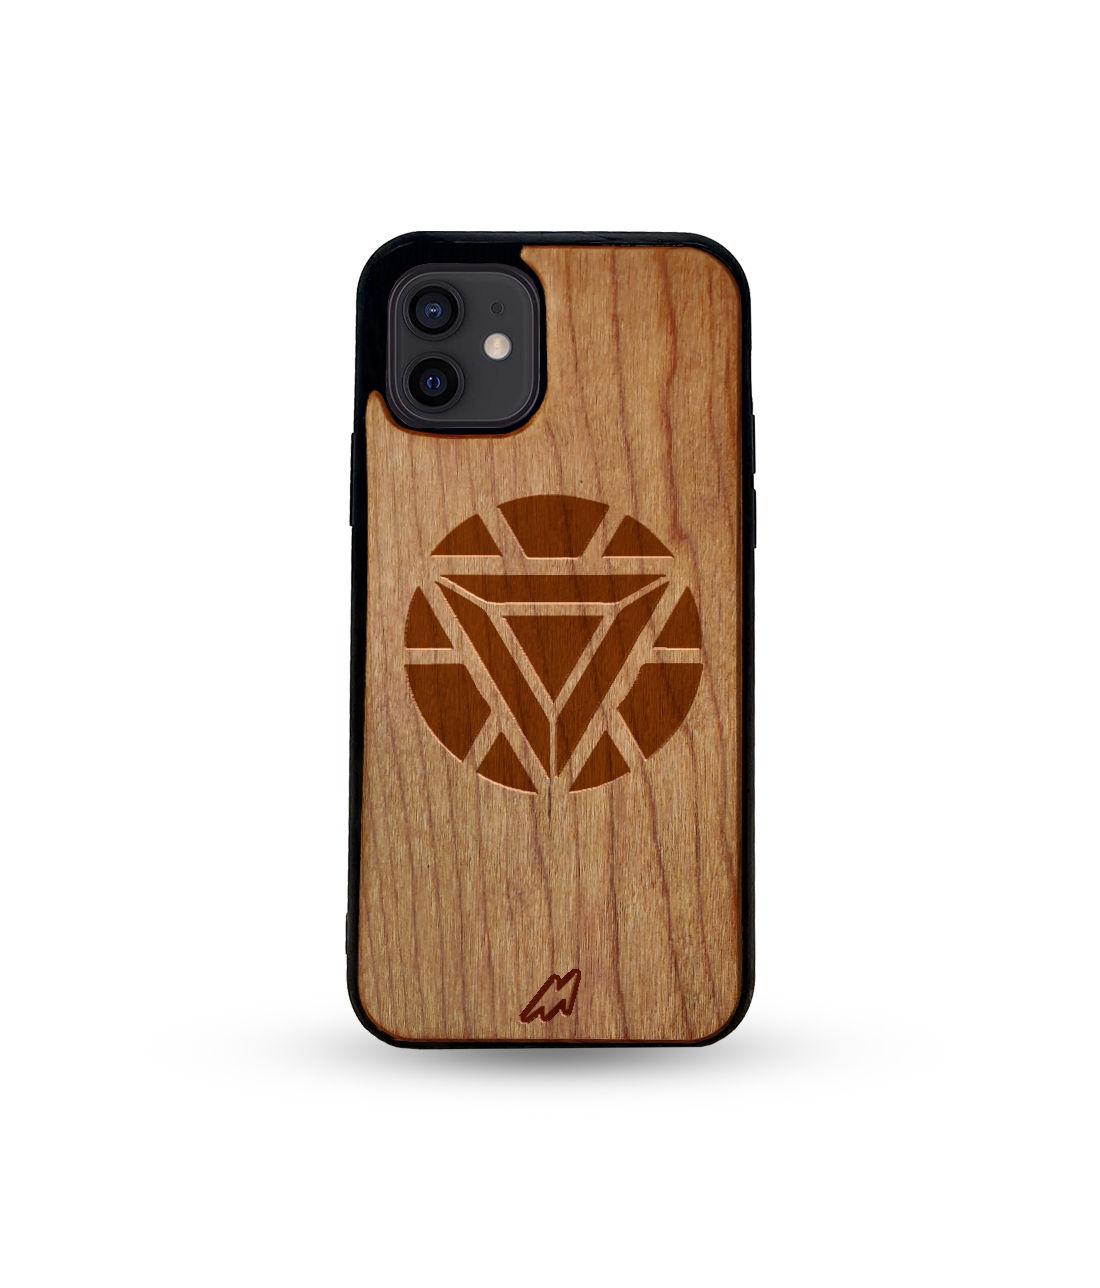 Arc Reactor Mark I - Honey Maple Wooden Phone Case for iPhone 12